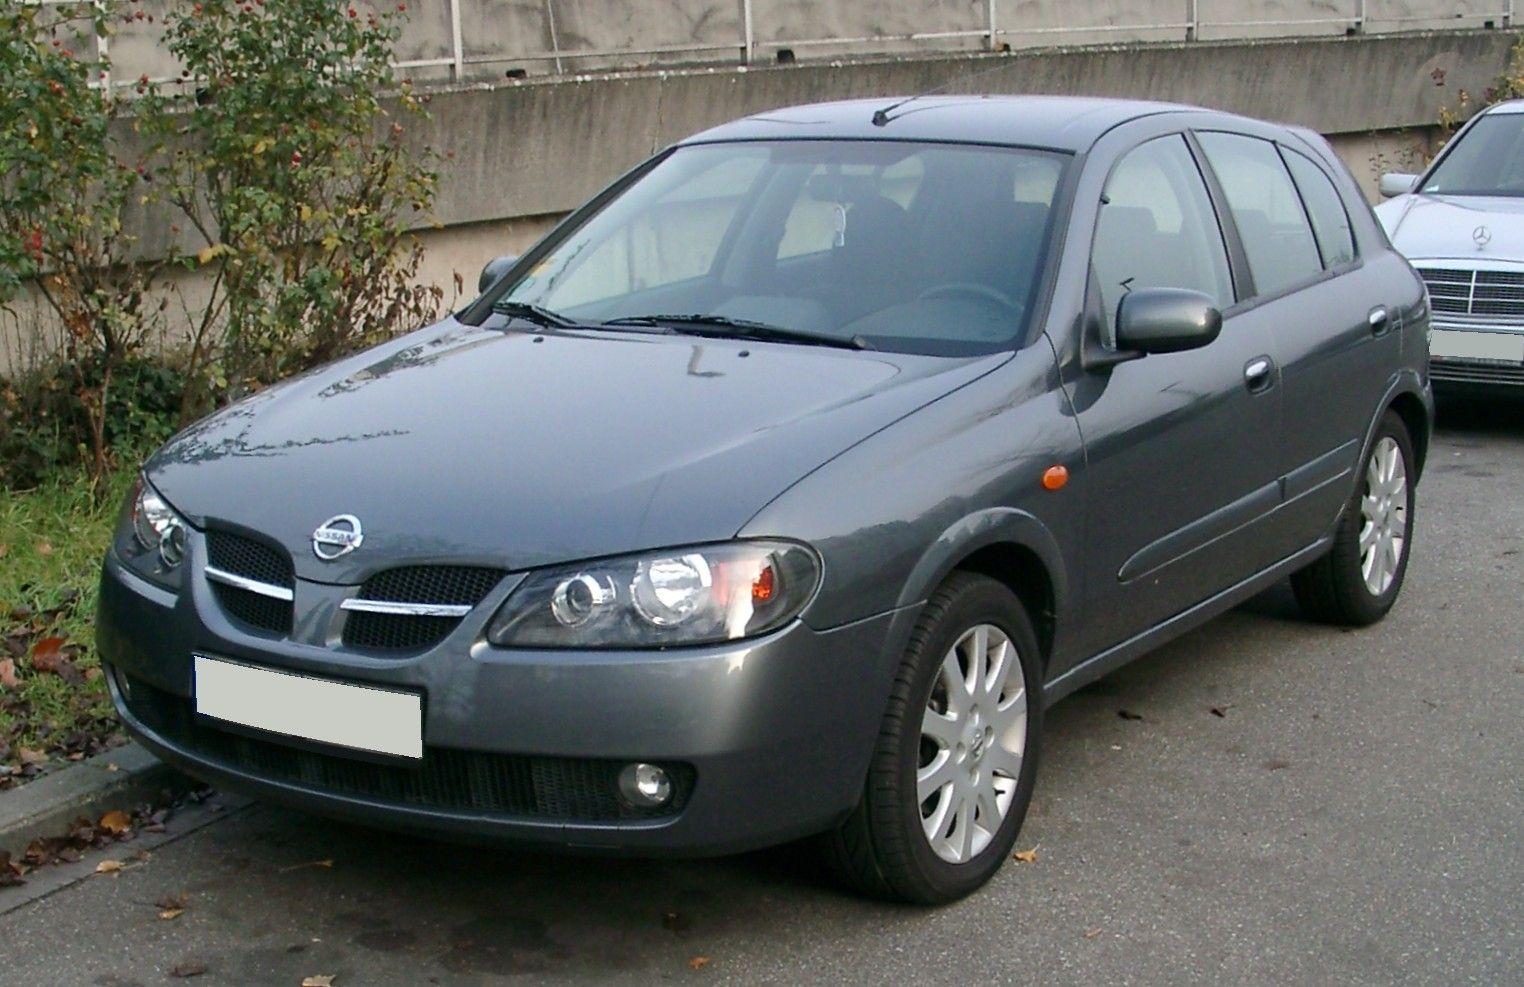 click on image to download 2001 nissan almera n16 service repair rh pinterest co uk 2012 Nissan Sentra 2013 Nissan Sentra